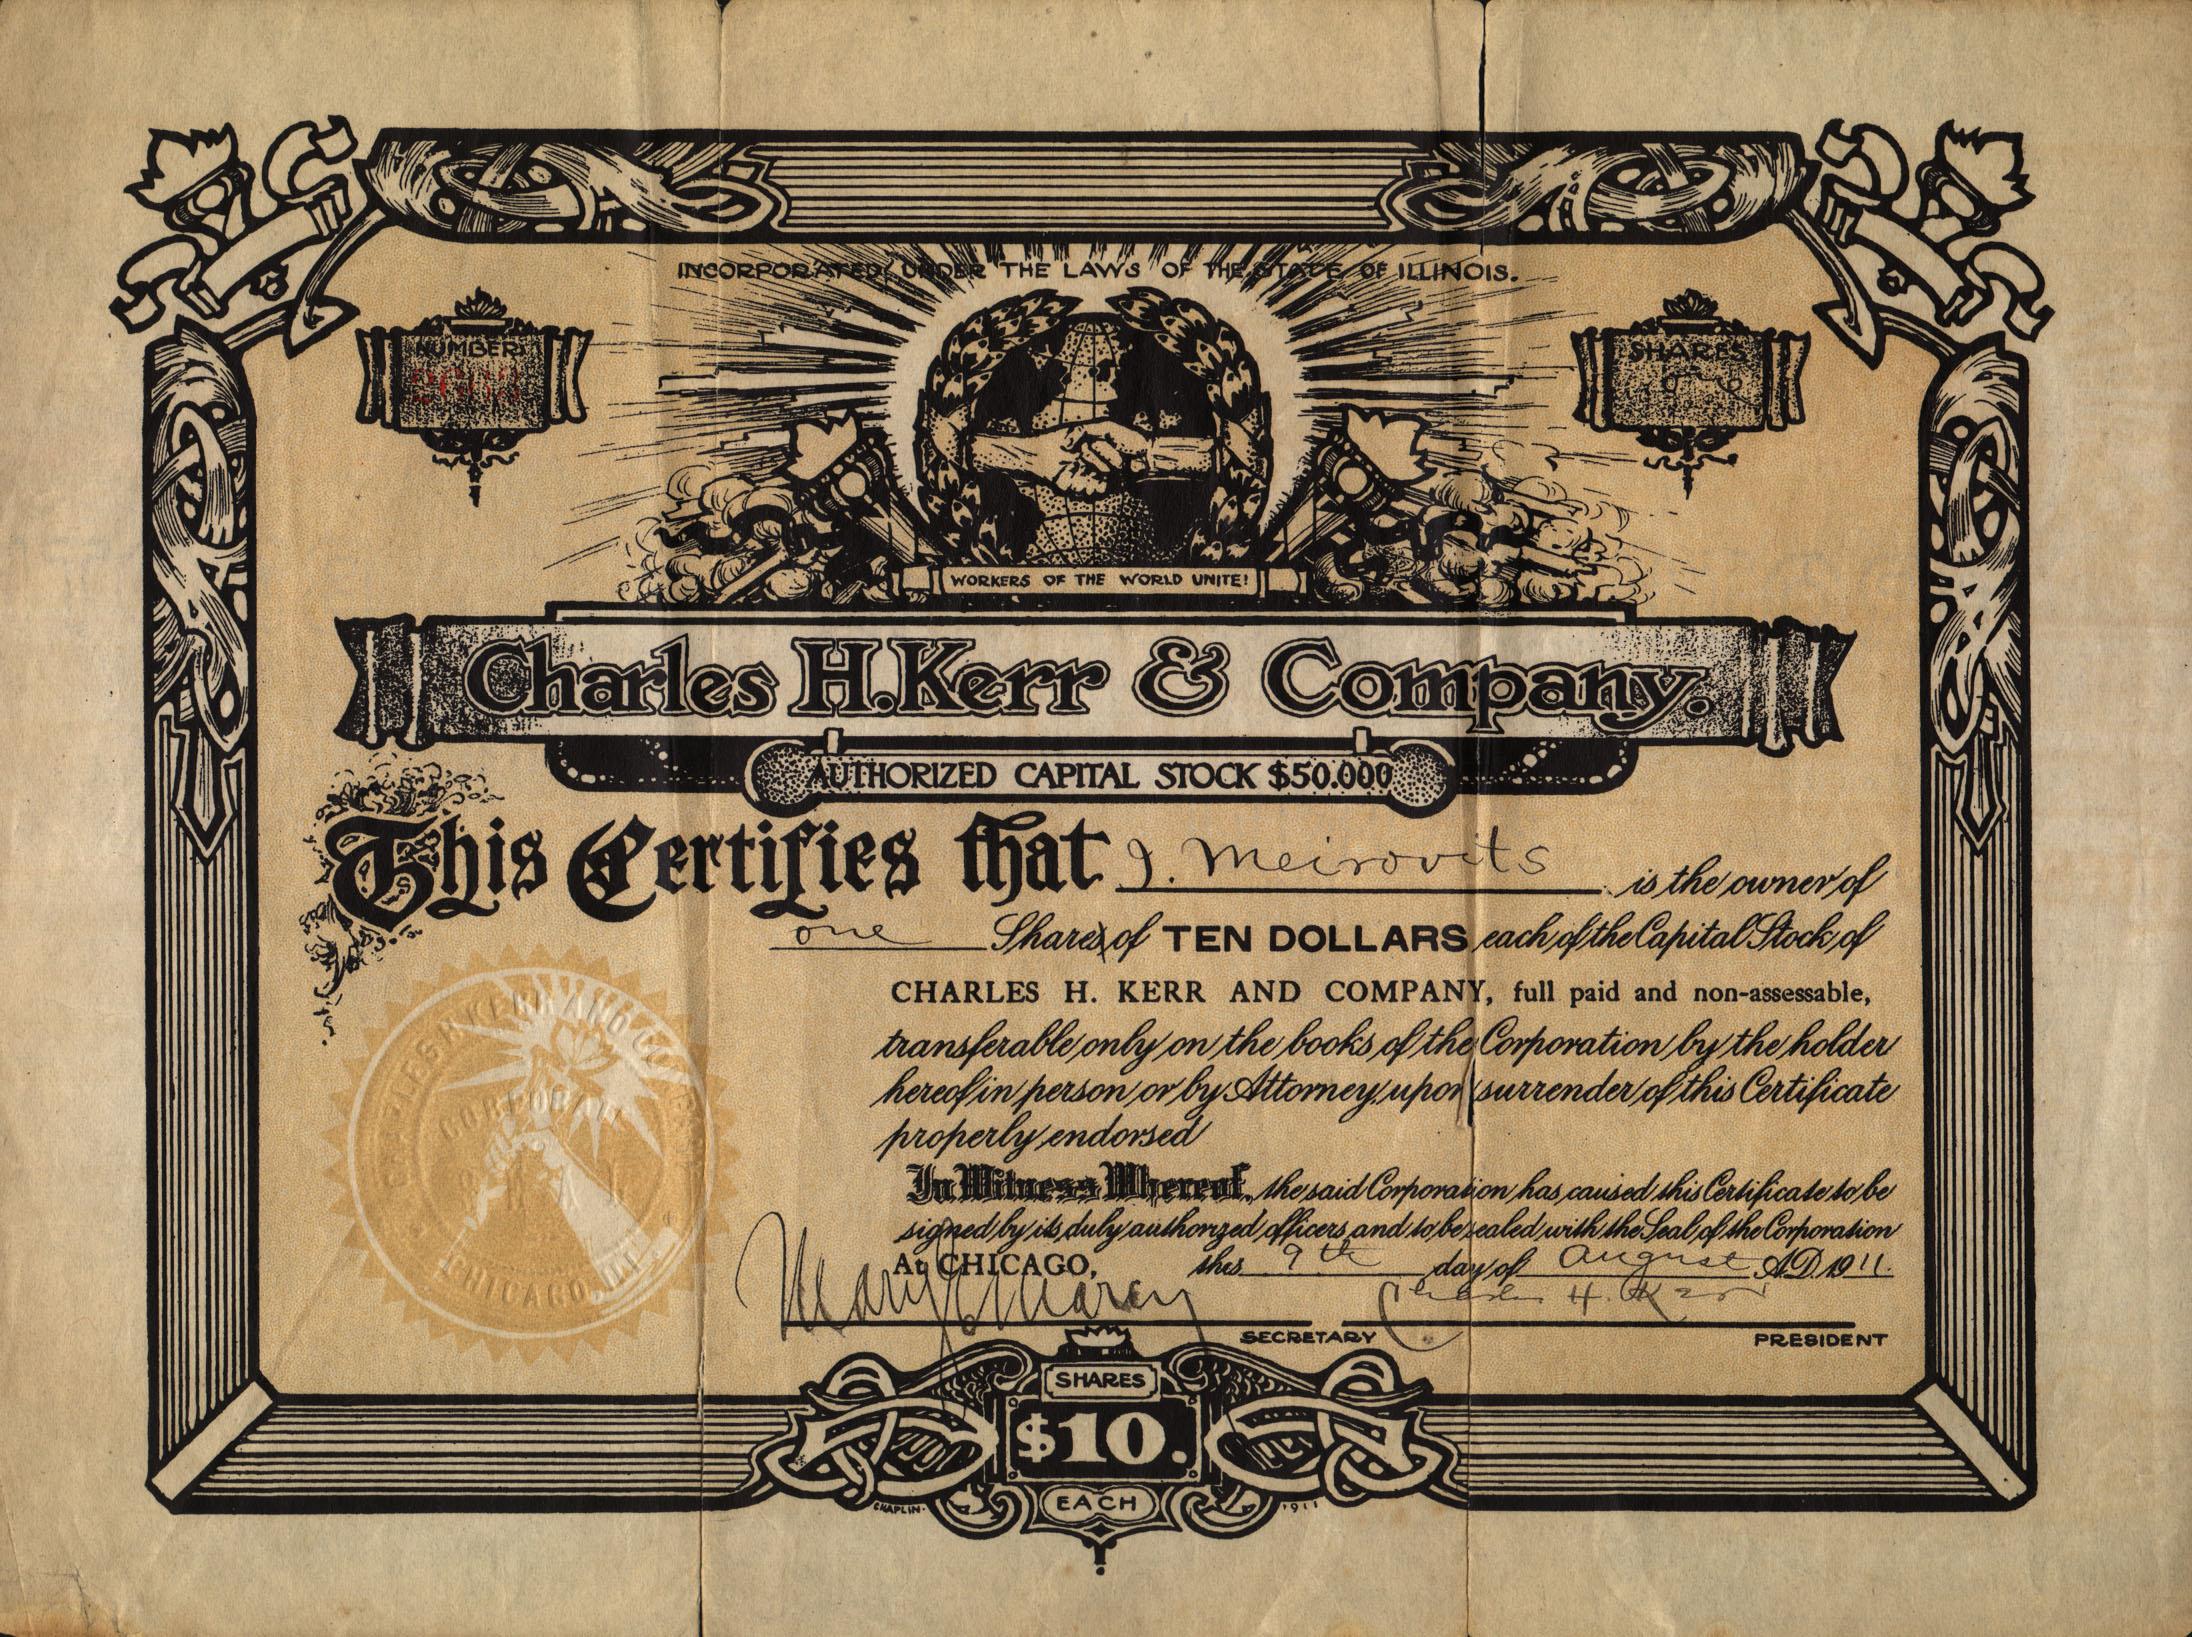 Filecharles h kerr irving meirovits stock certificate 200dpig filecharles h kerr irving meirovits stock certificate 200dpig 1betcityfo Choice Image